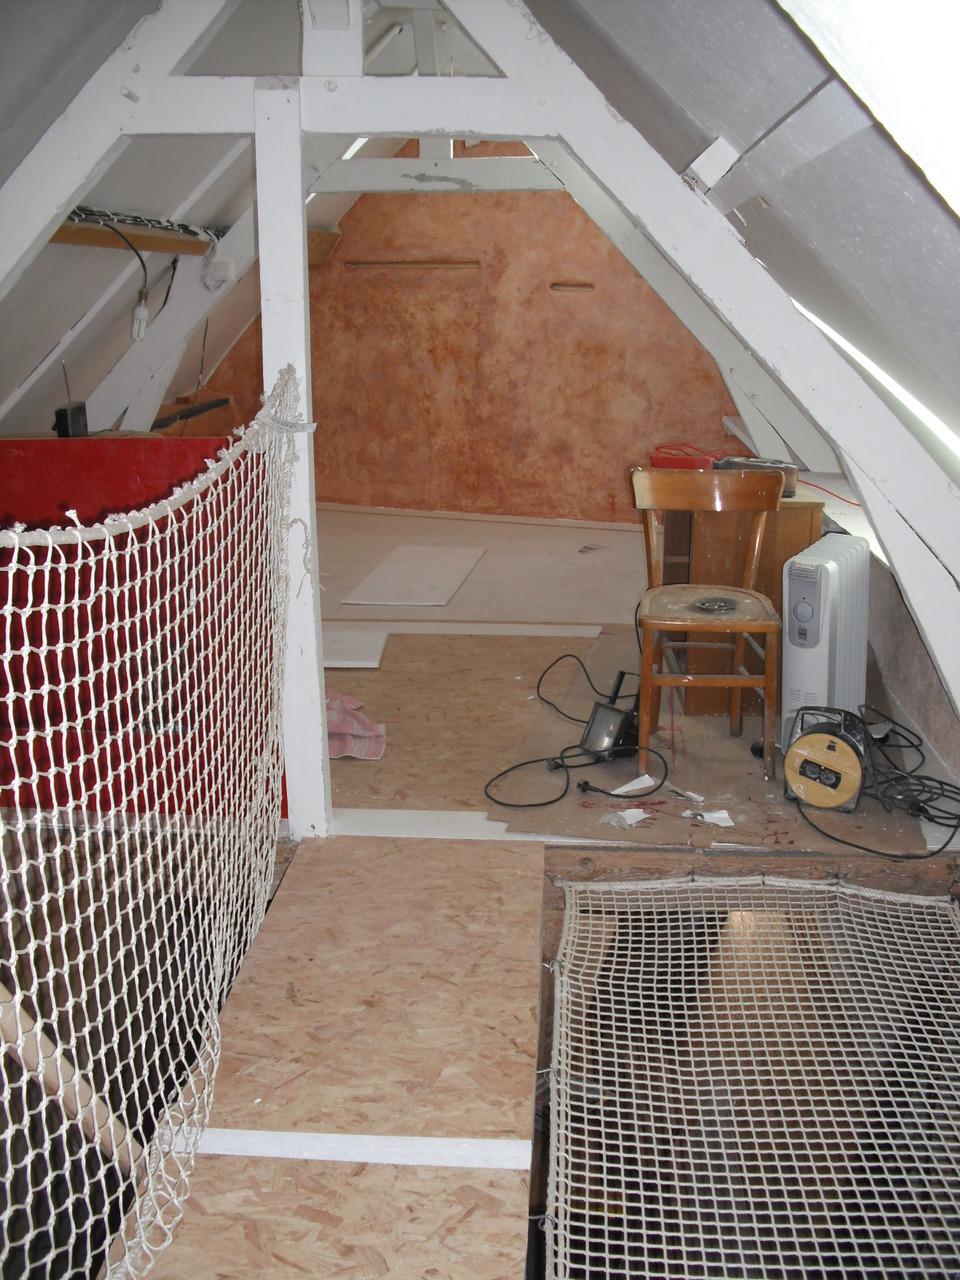 mon espace chambre janvier 2011 le haut 39 presque fini 39 galerie la r no int grale de ma. Black Bedroom Furniture Sets. Home Design Ideas